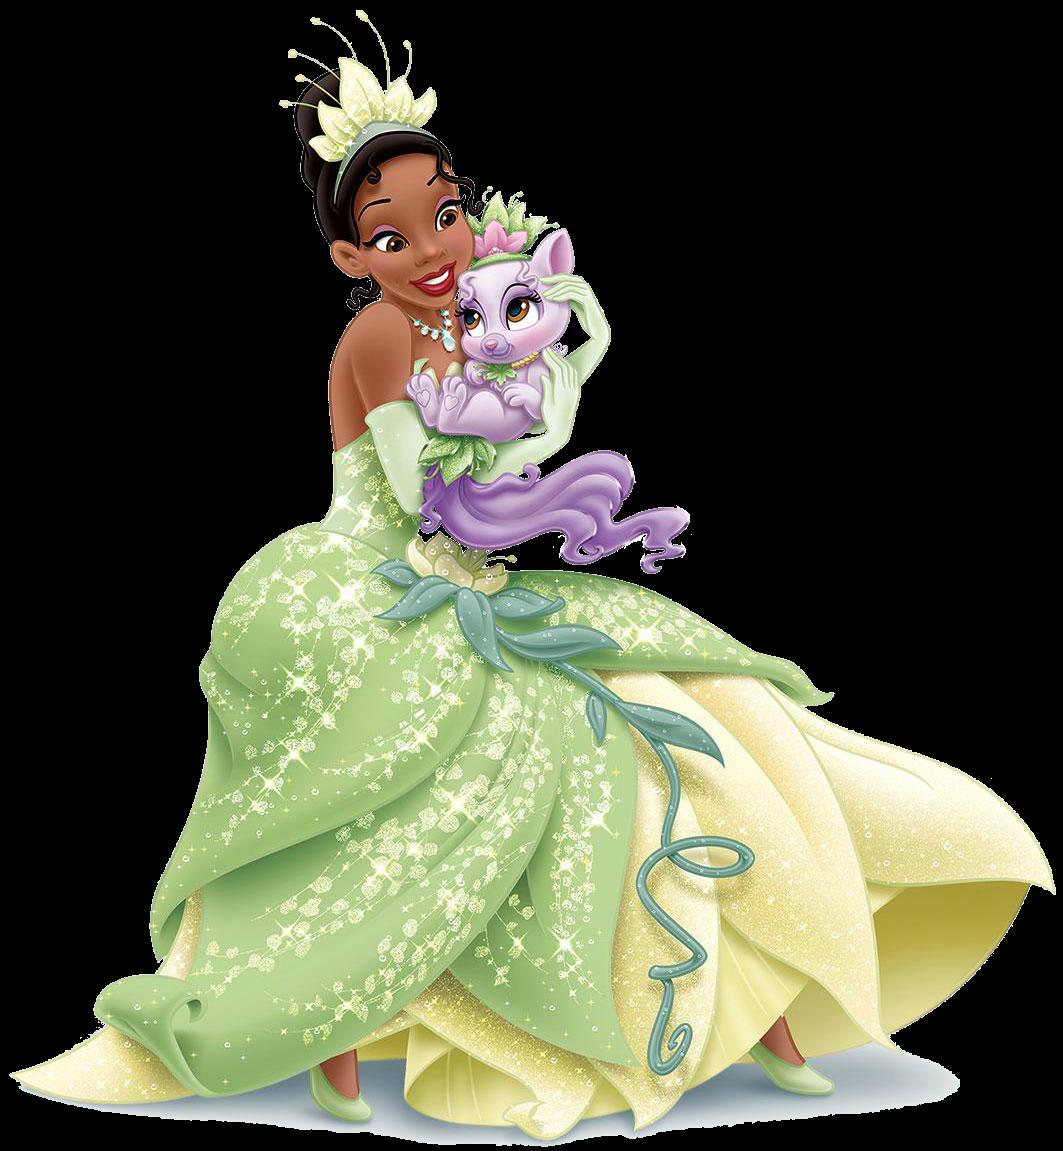 Disney clipart tiana. Image png wiki fandom